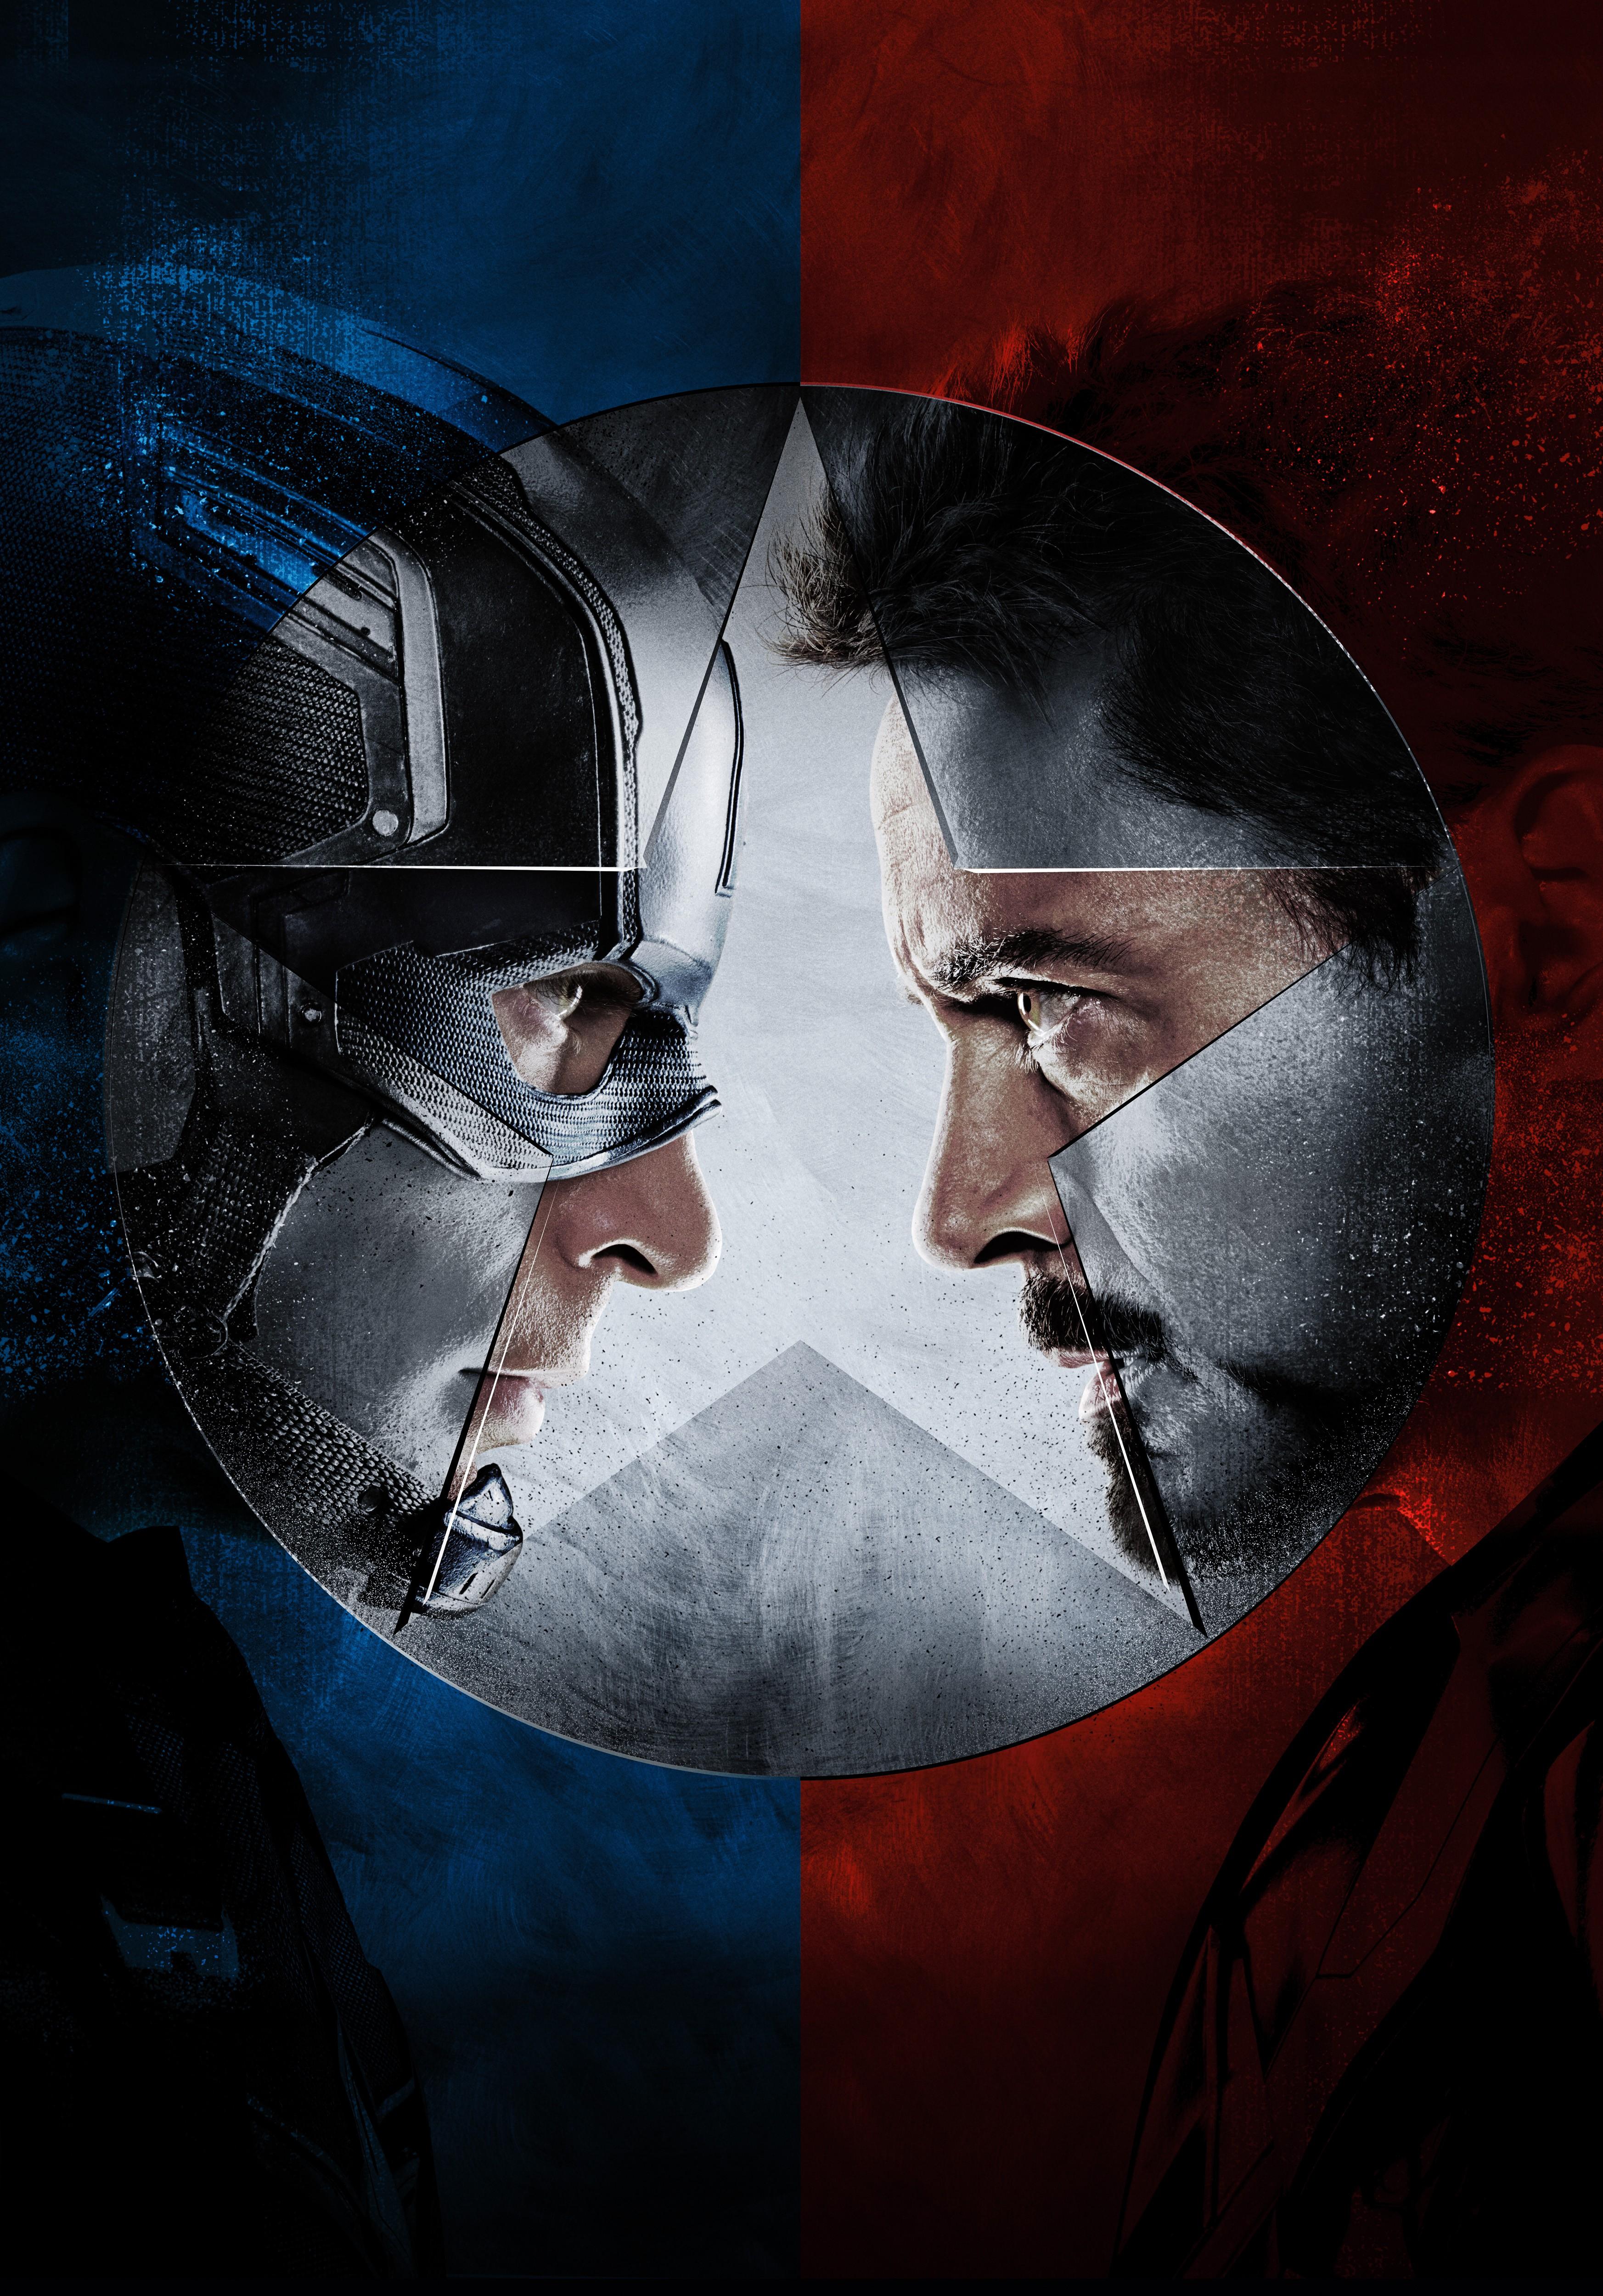 Captain America Iron Man Civil War 2016 Movies Wallpaper Hd